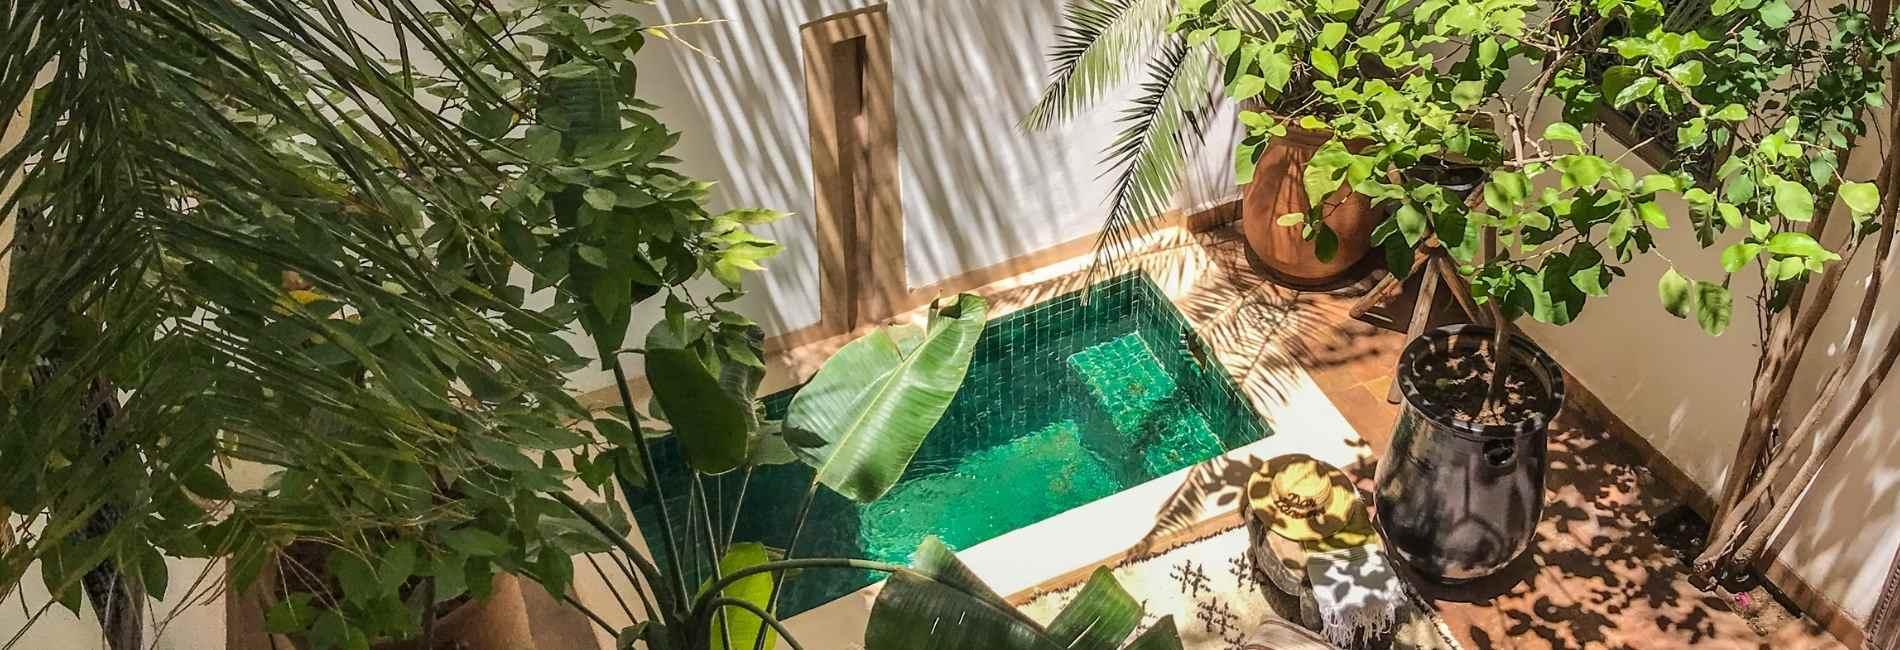 marrakech riad dipping pool